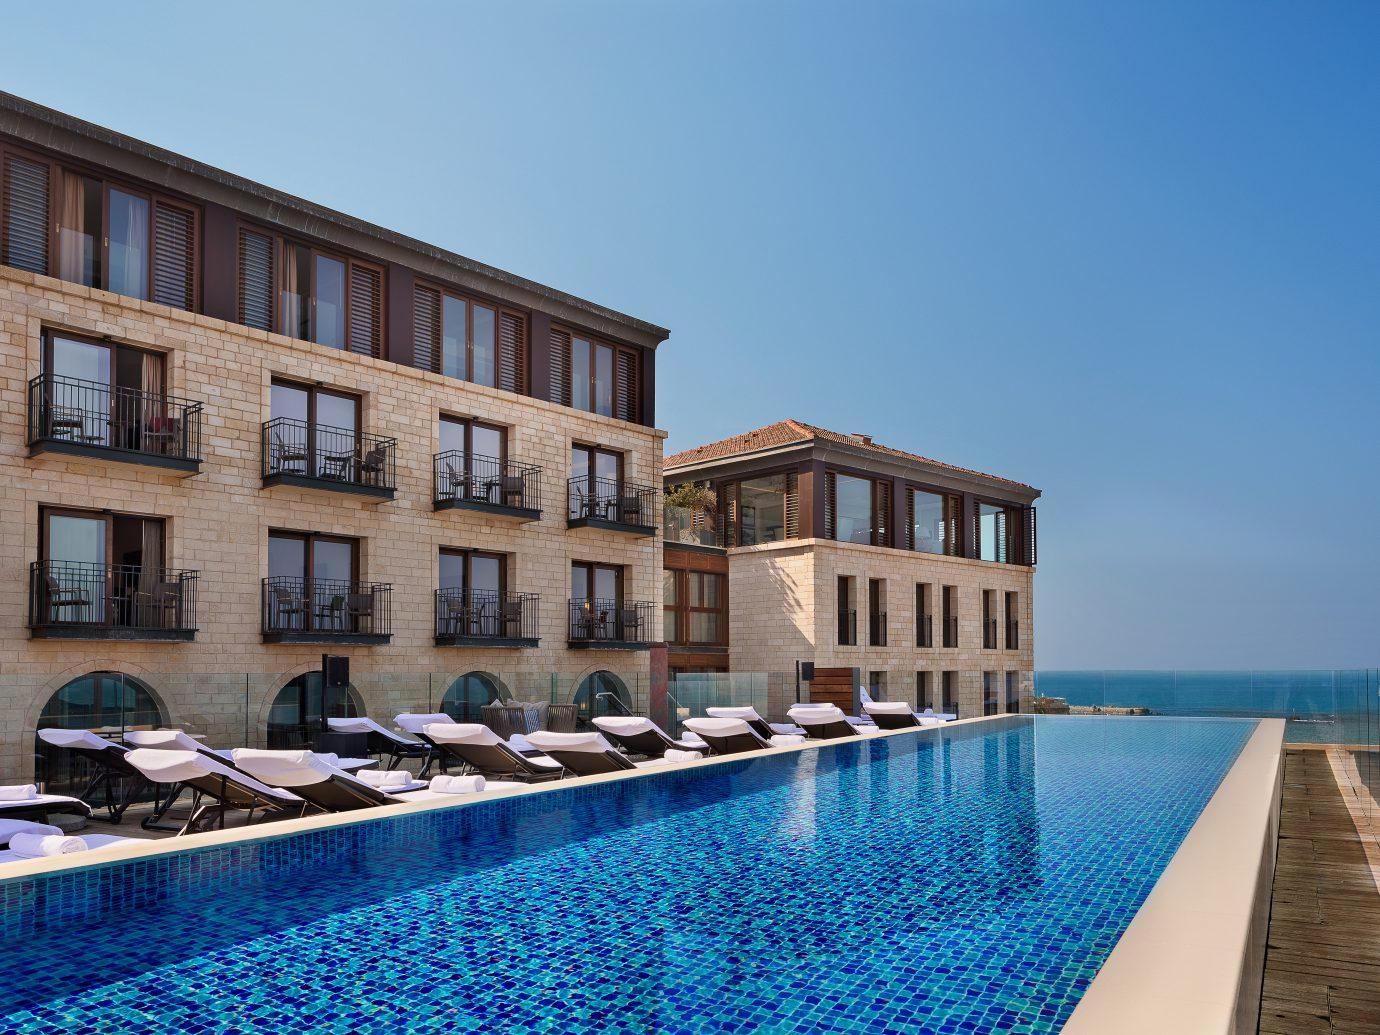 pool at Setai Tel Aviv, Israel